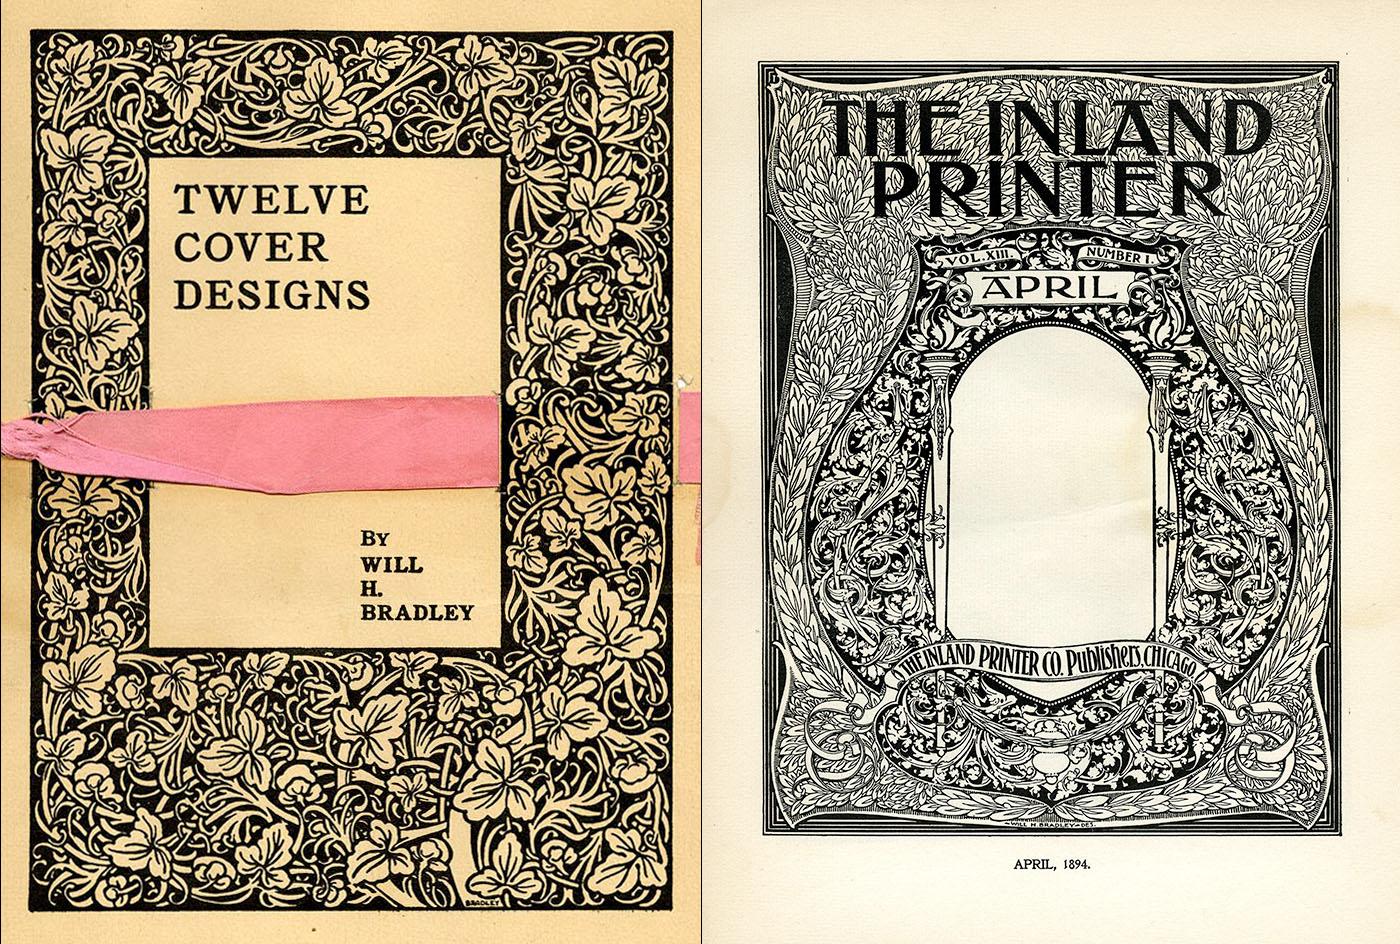 Twelve Cover Designs By Will H. Bradley